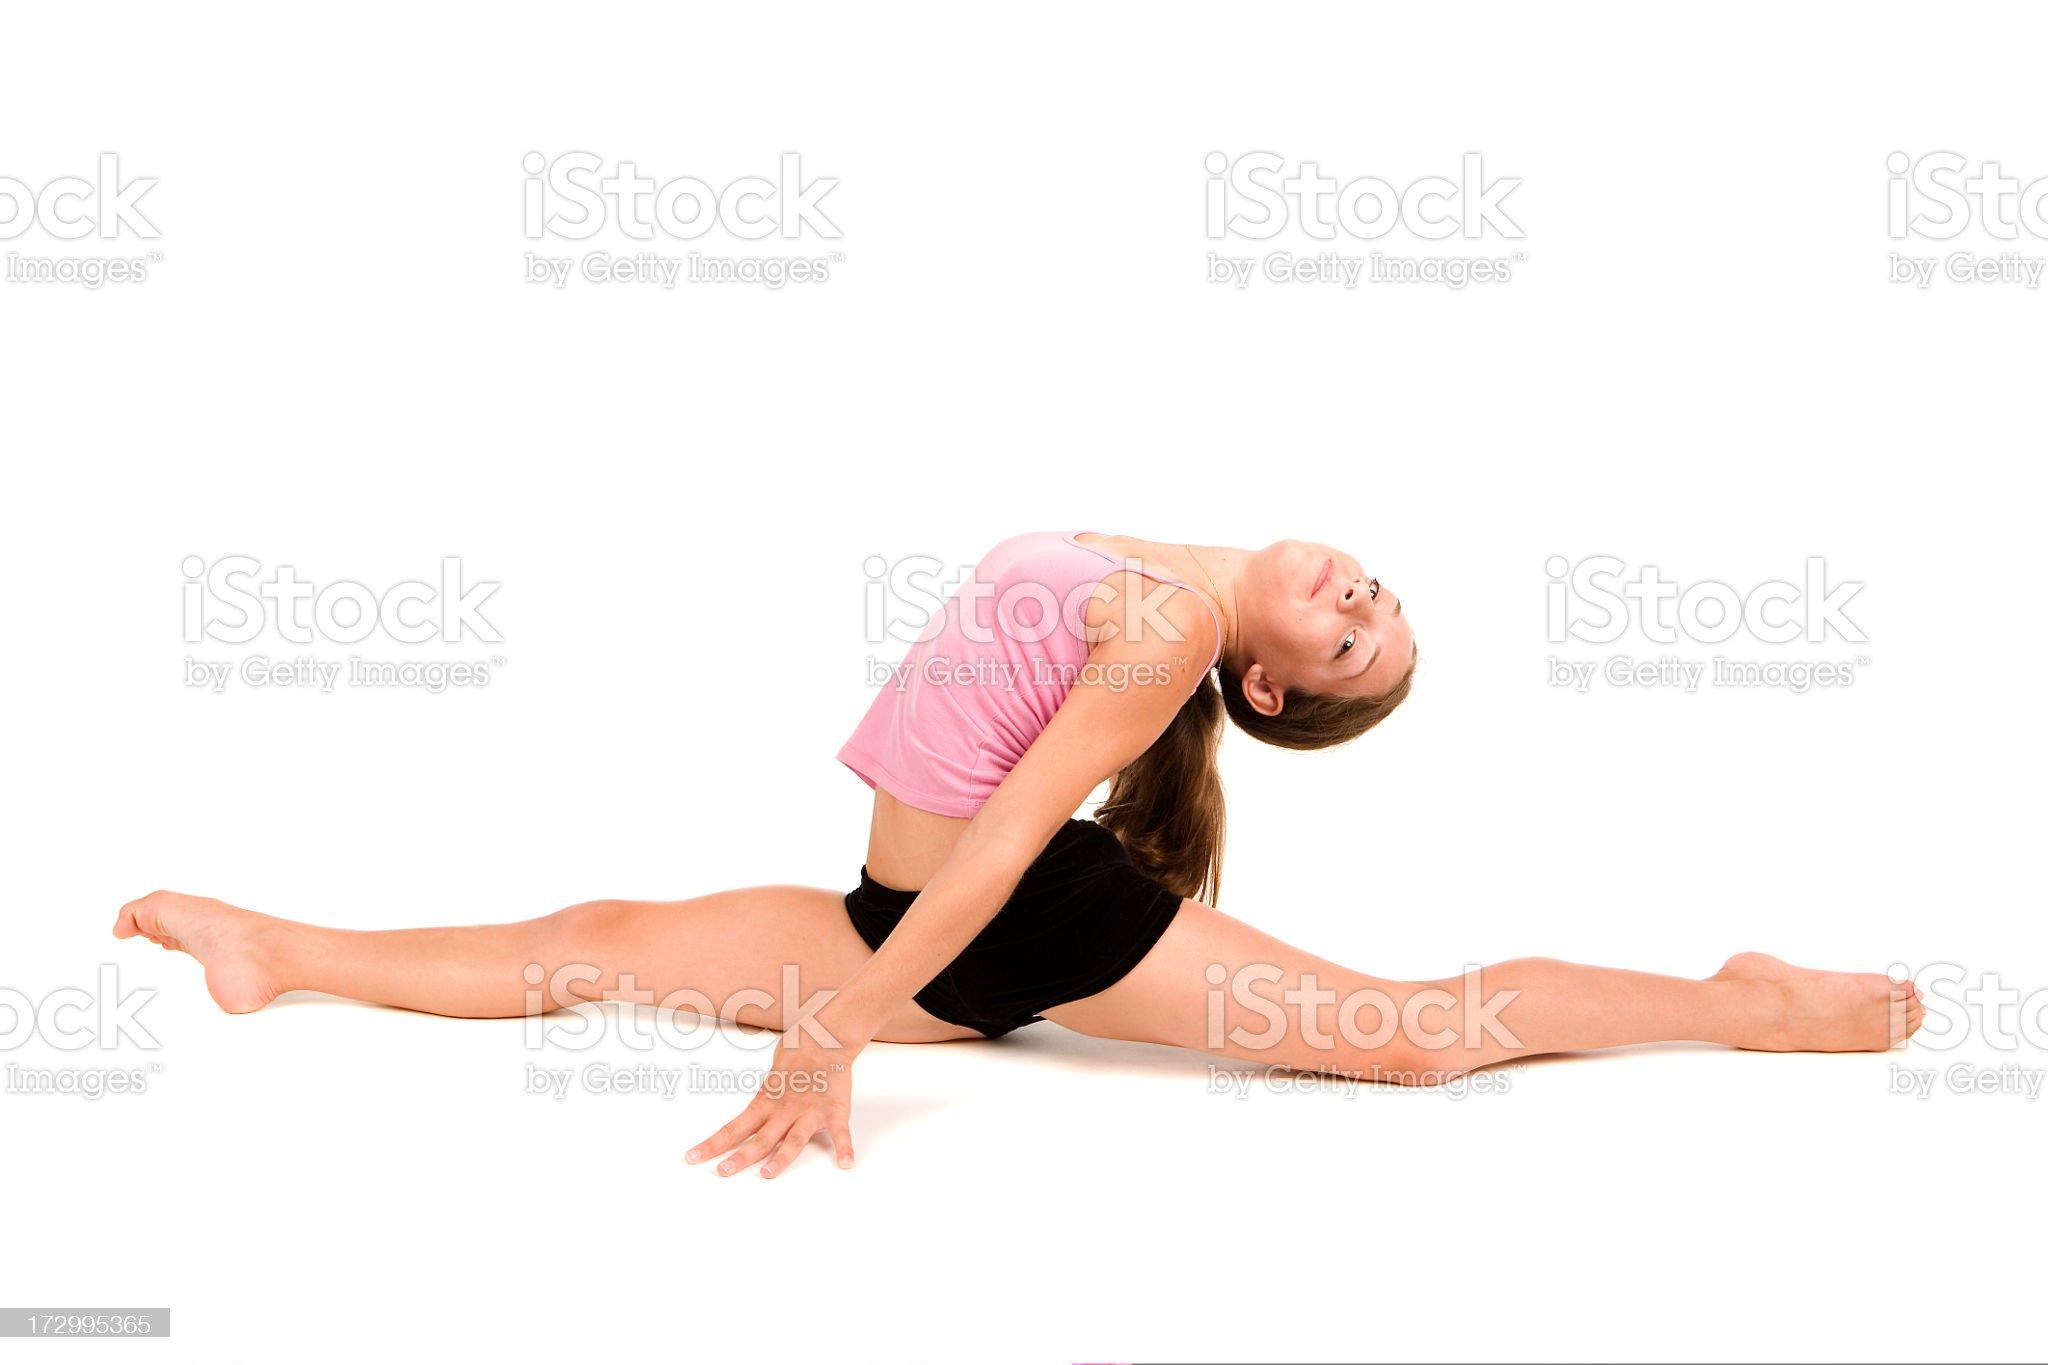 Flexible royalty-free stock photo